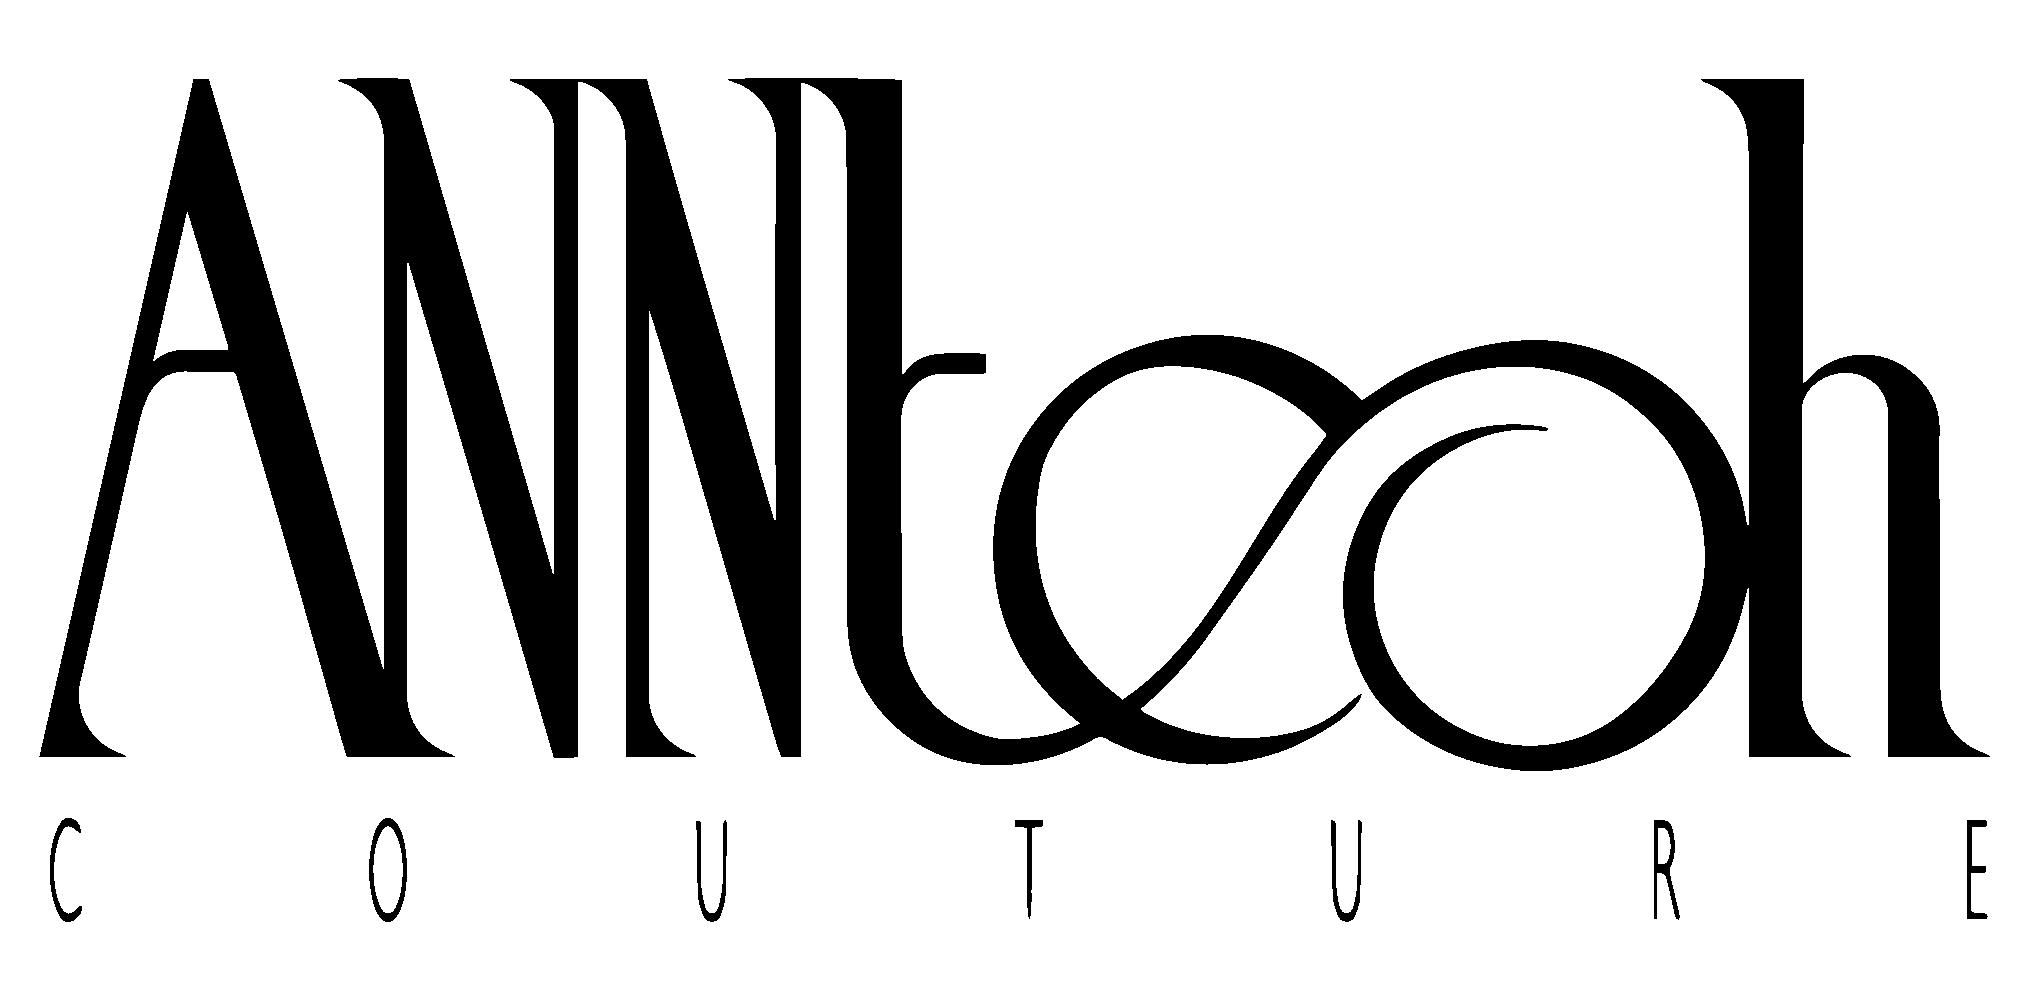 AnnTeoh_Logo.png